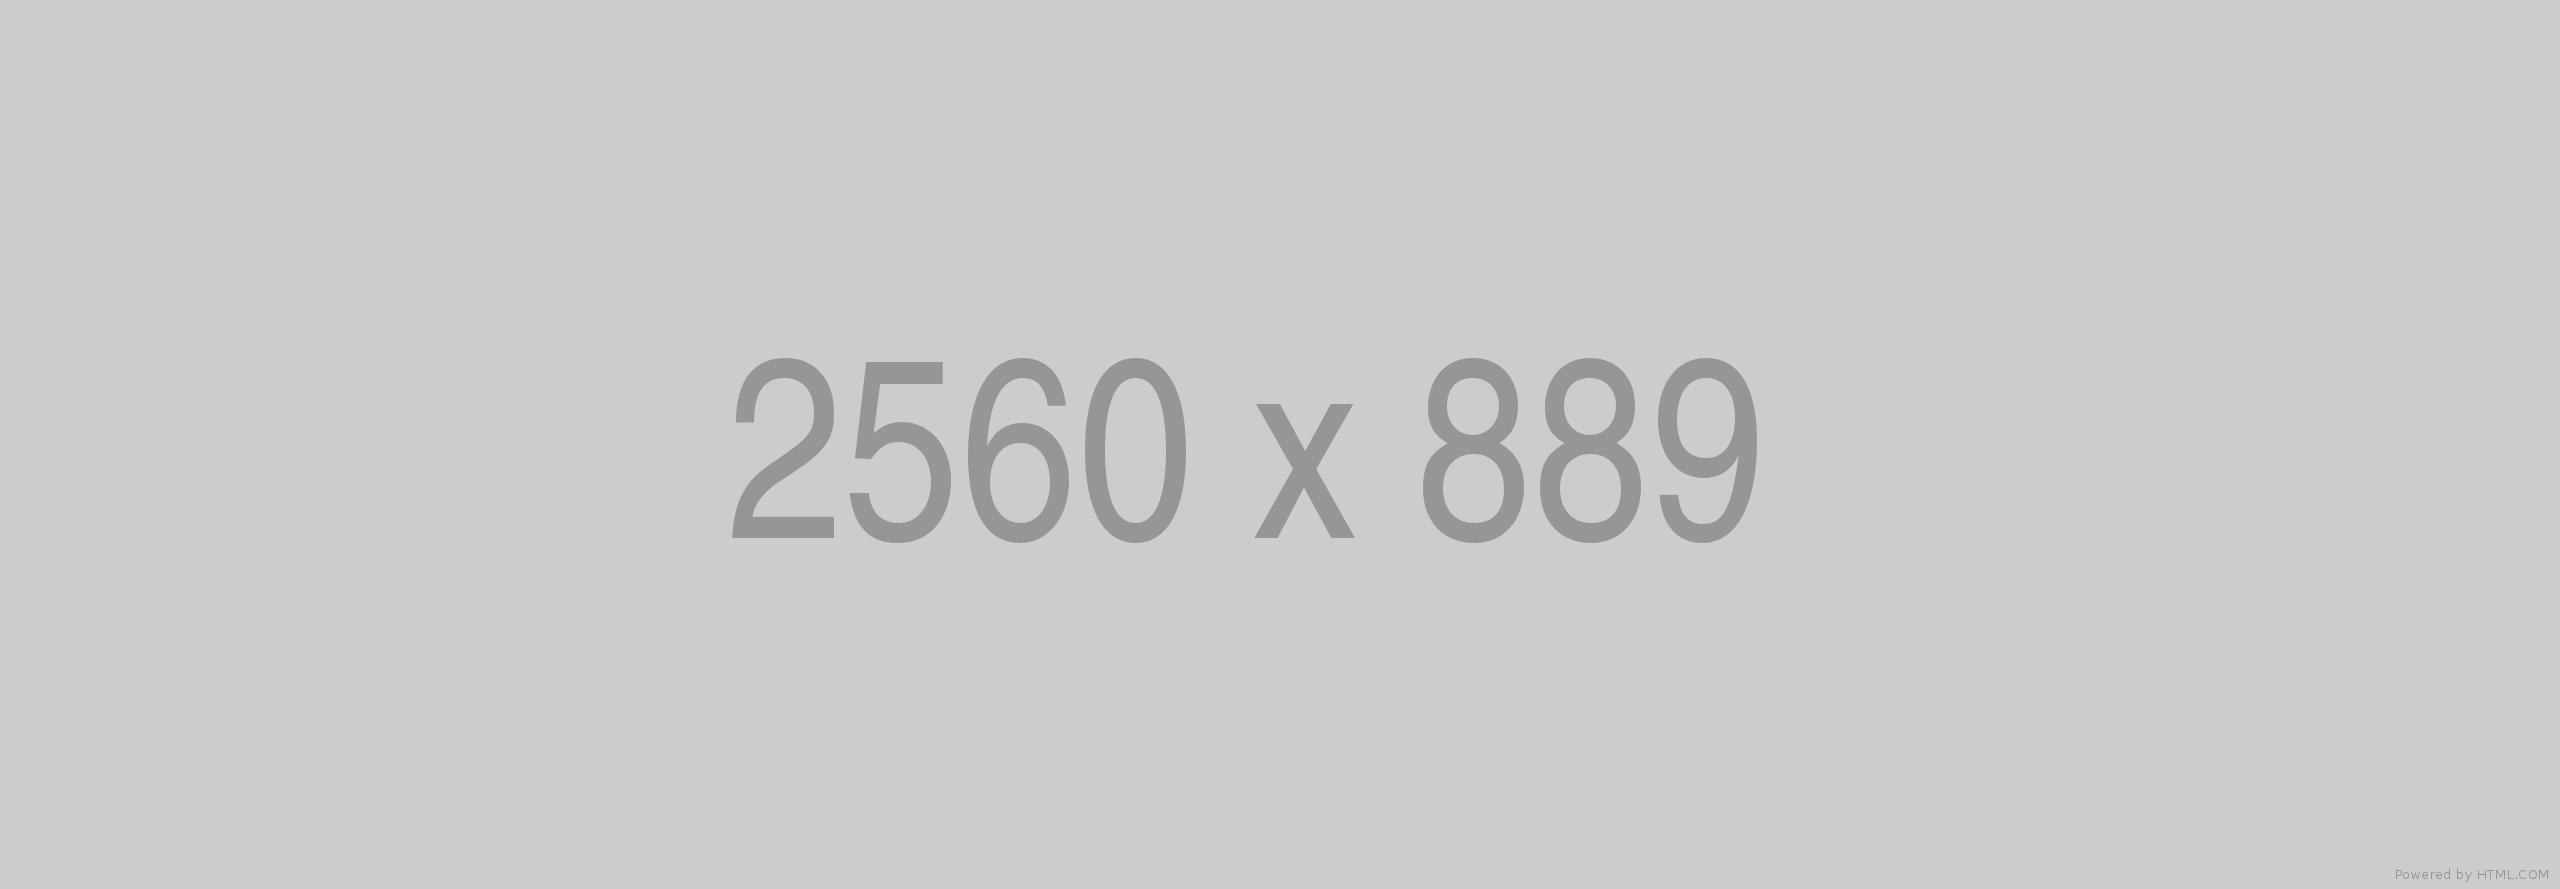 2560x889